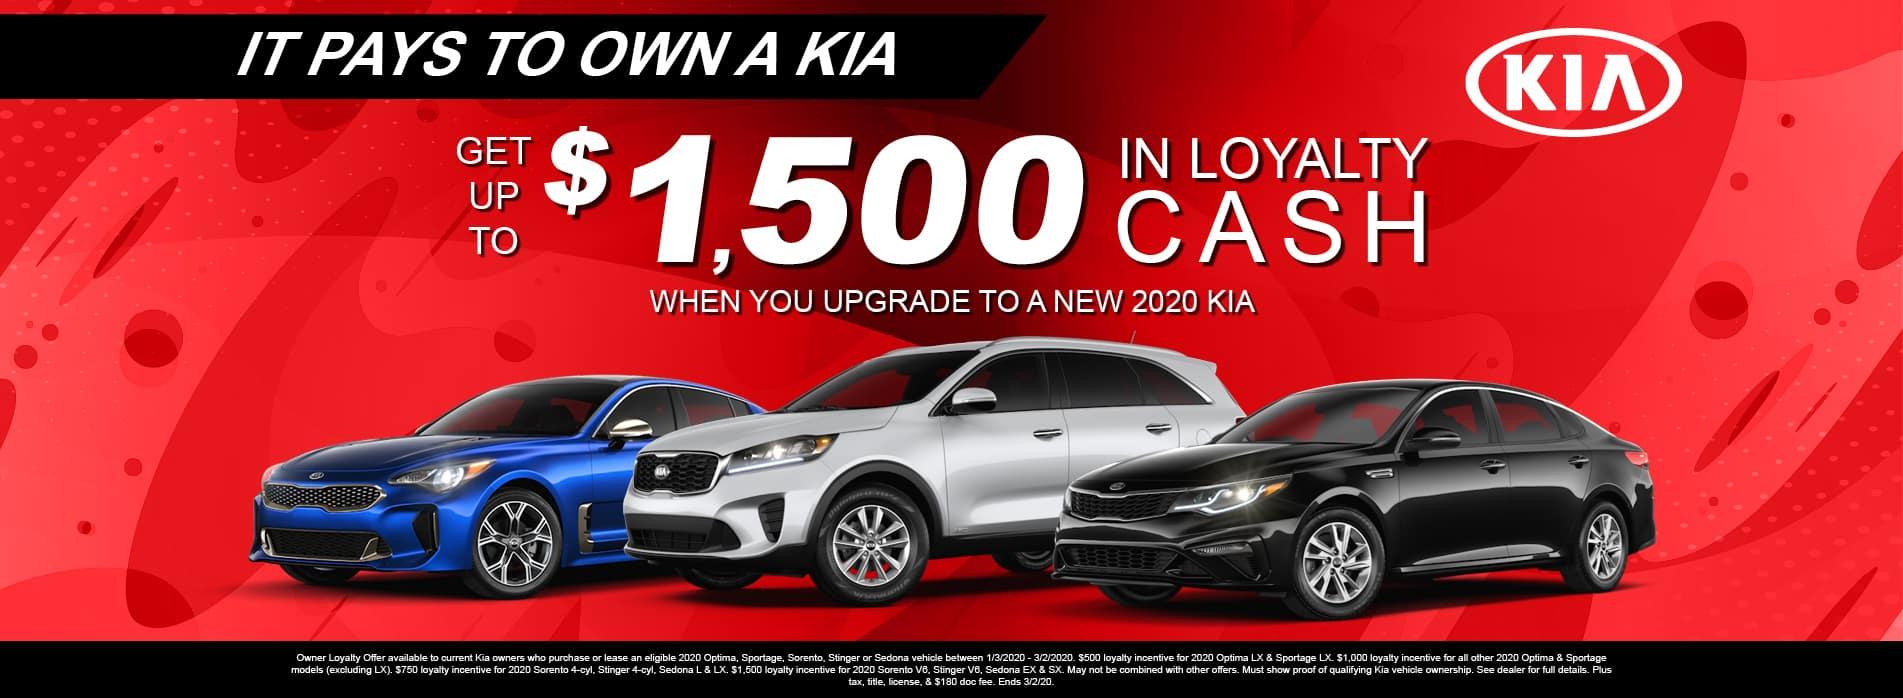 Smart_Kia_Loyalty_Cash